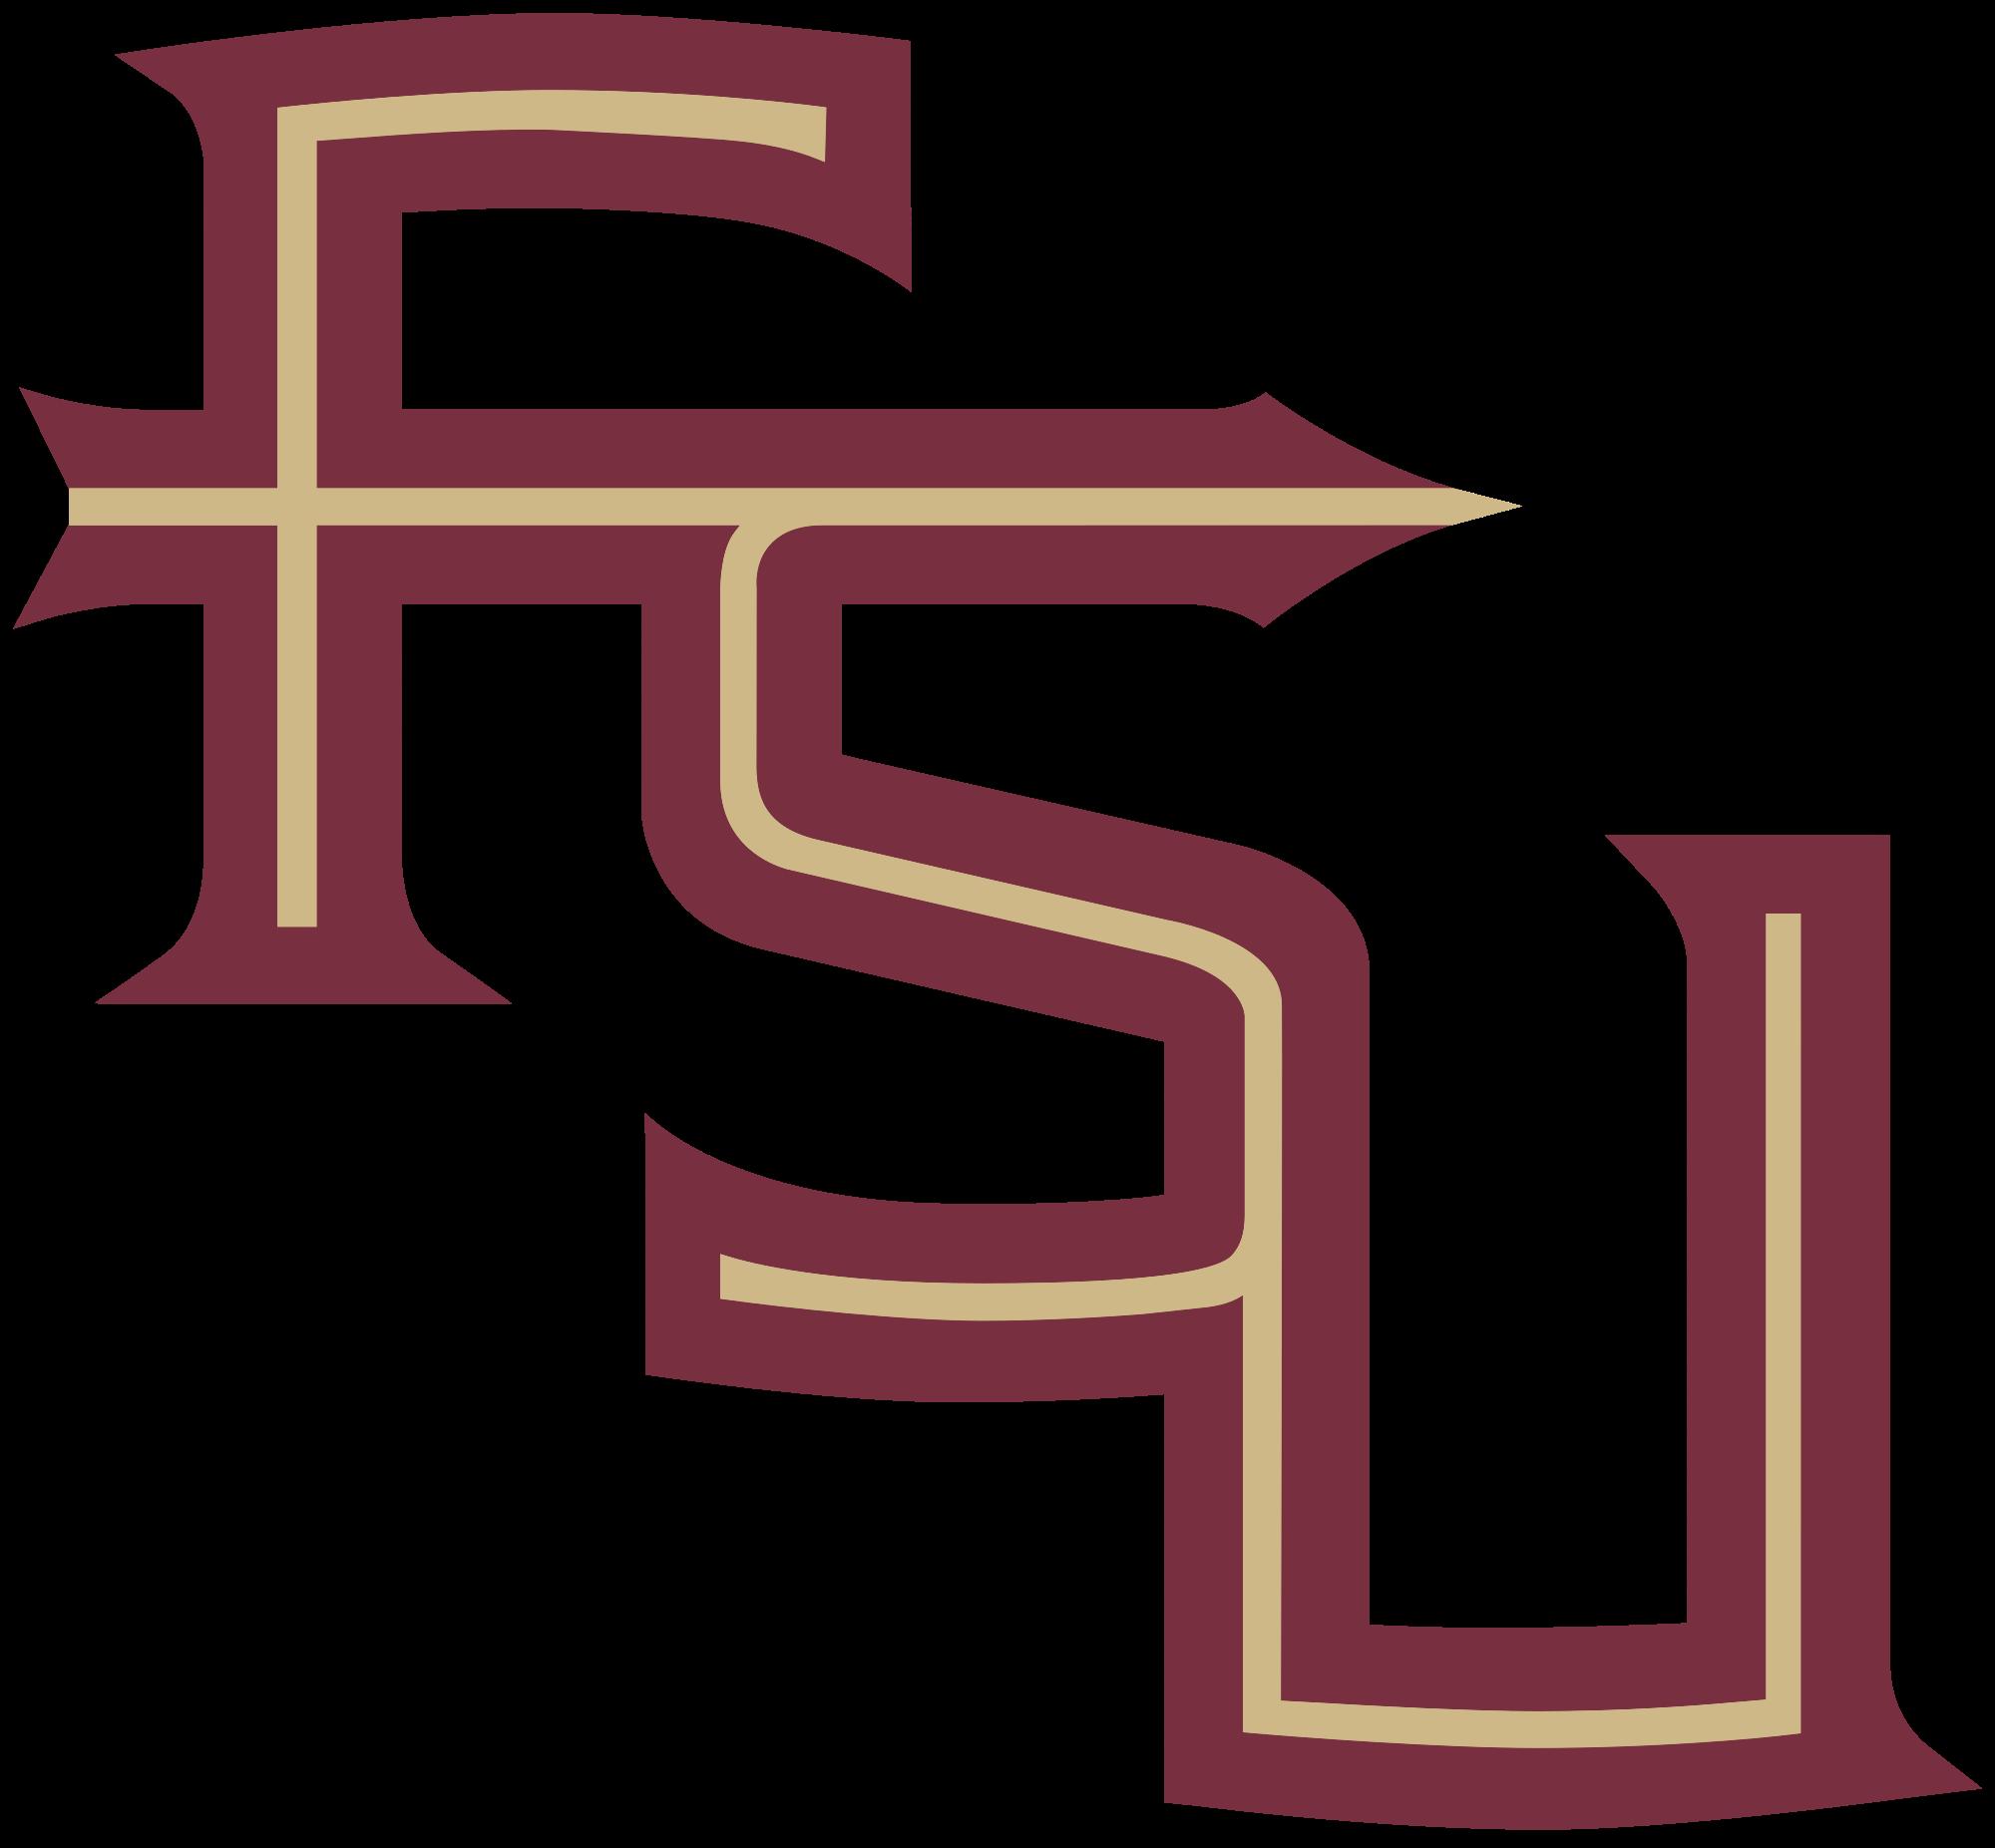 Logo clipart fsu, Logo fsu Transparent FREE for download on.